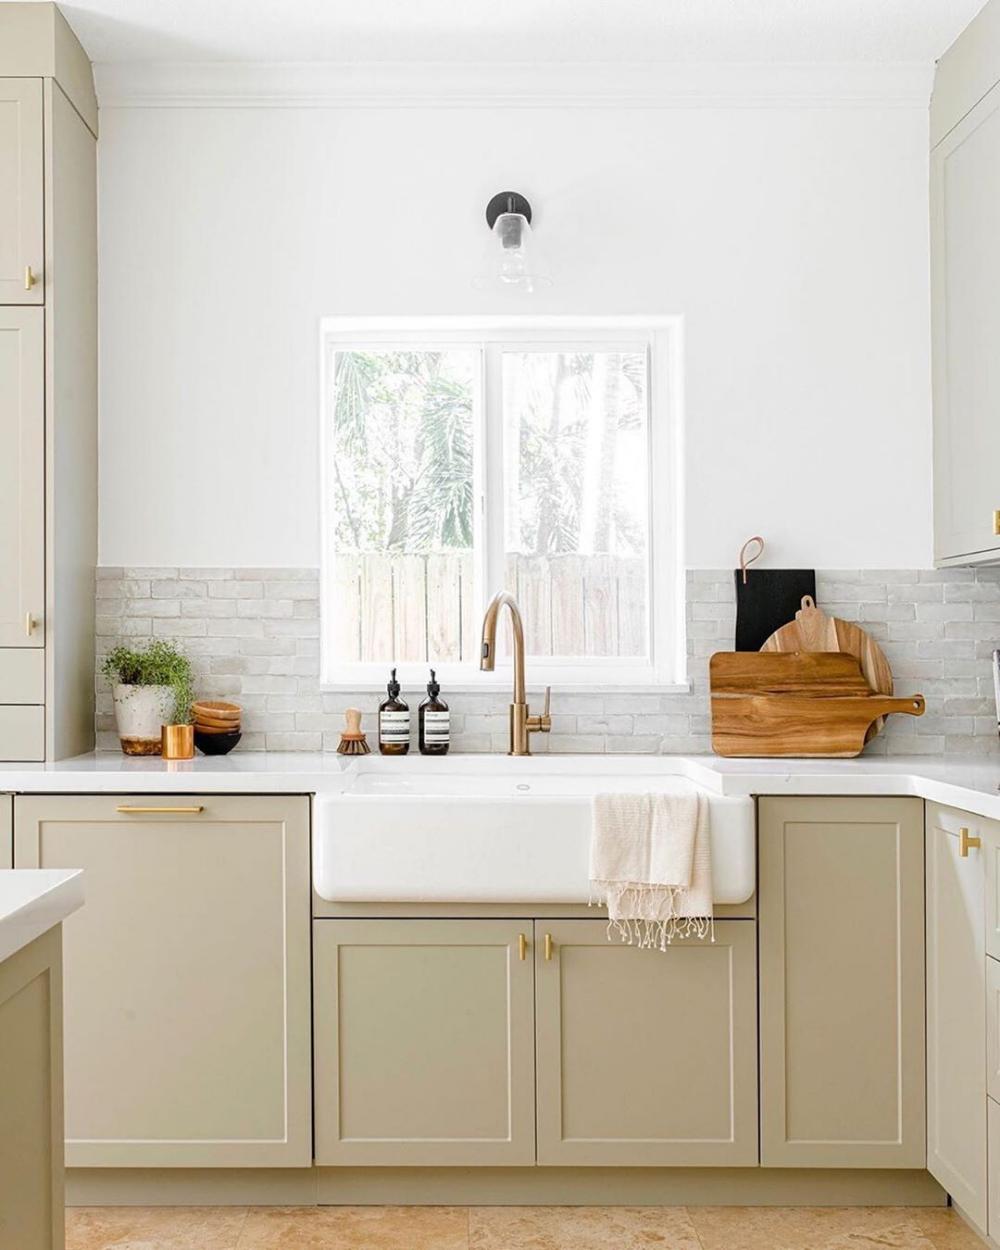 Doors For Ikea Cabinets Kitchen Bathroom Closet Media Semihandmade In 2020 Design Your Kitchen Residential Interior Design Kitchen